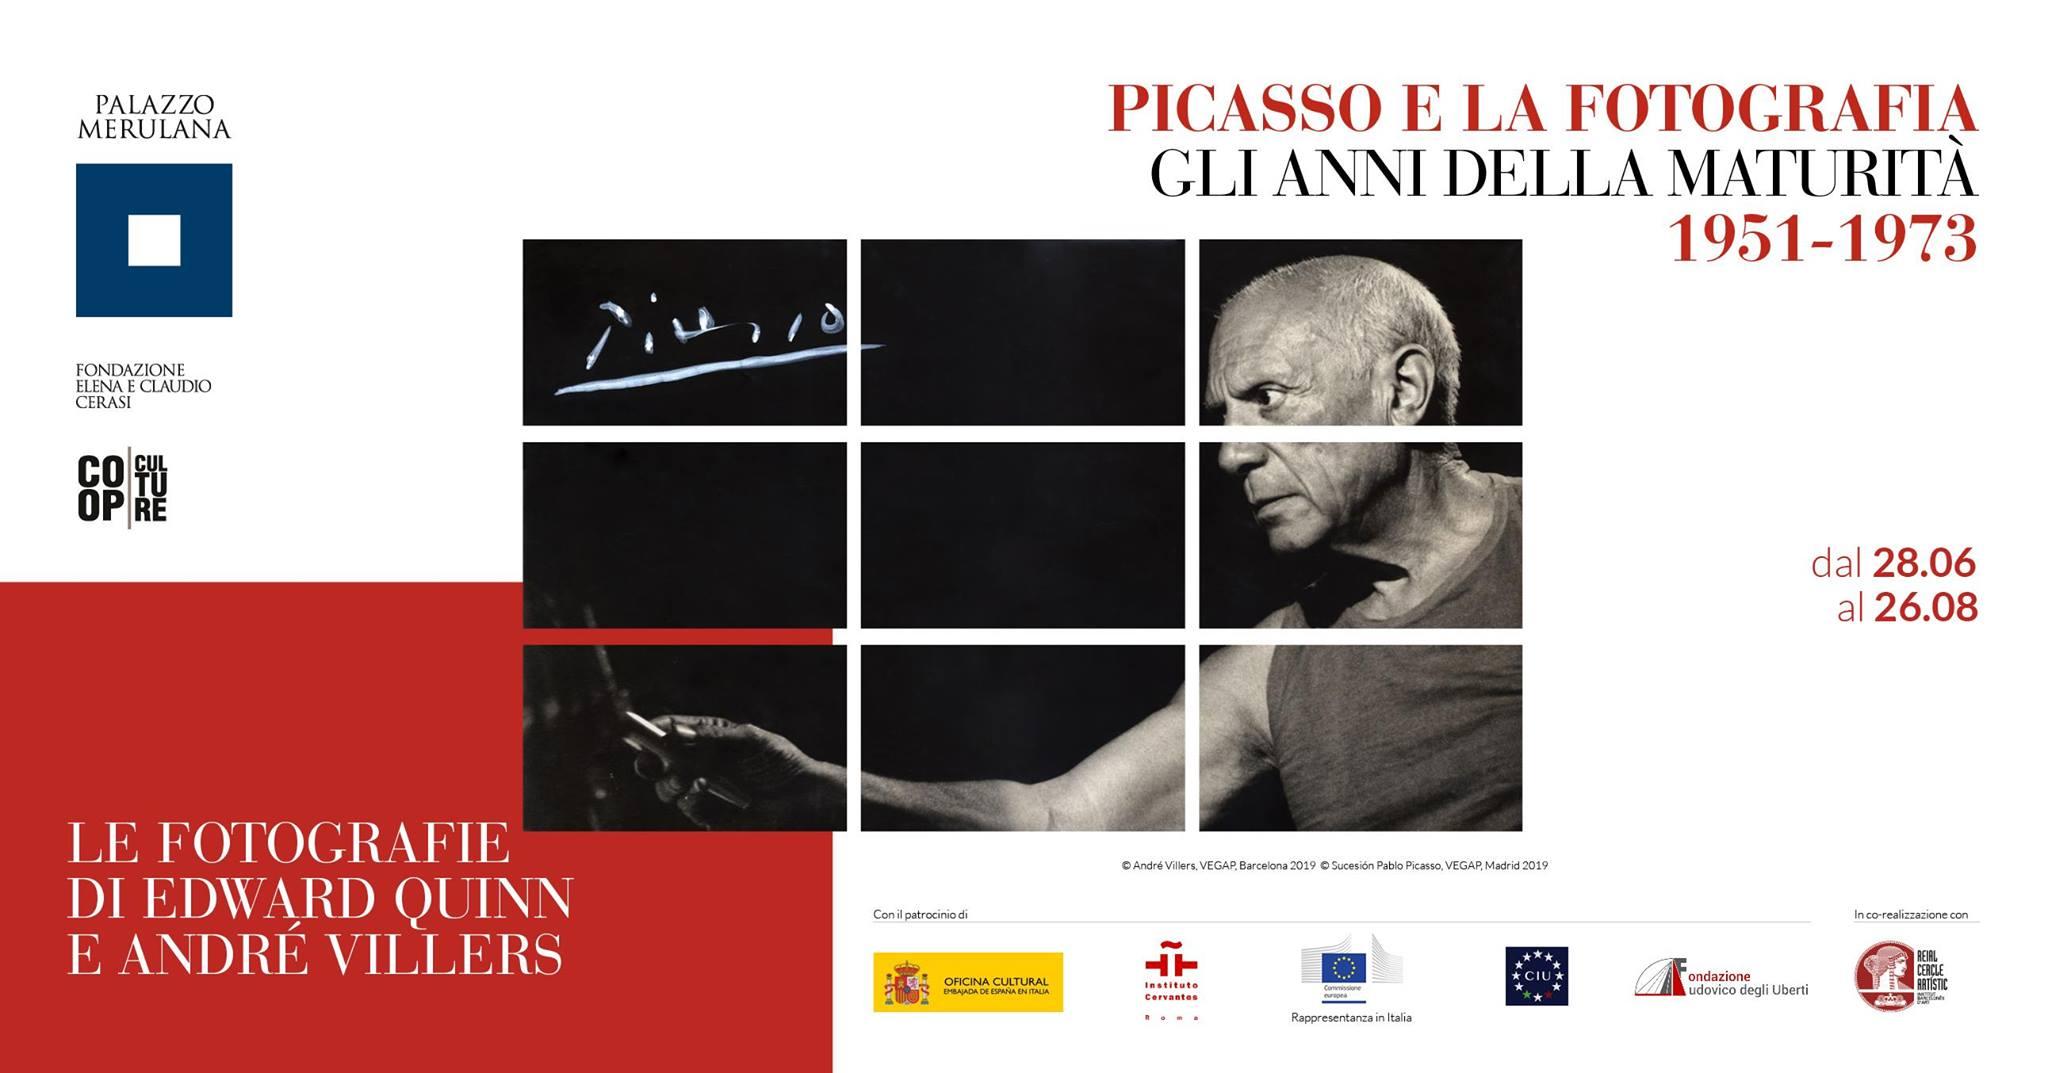 MOSTRA Picasso palazzo Merulana